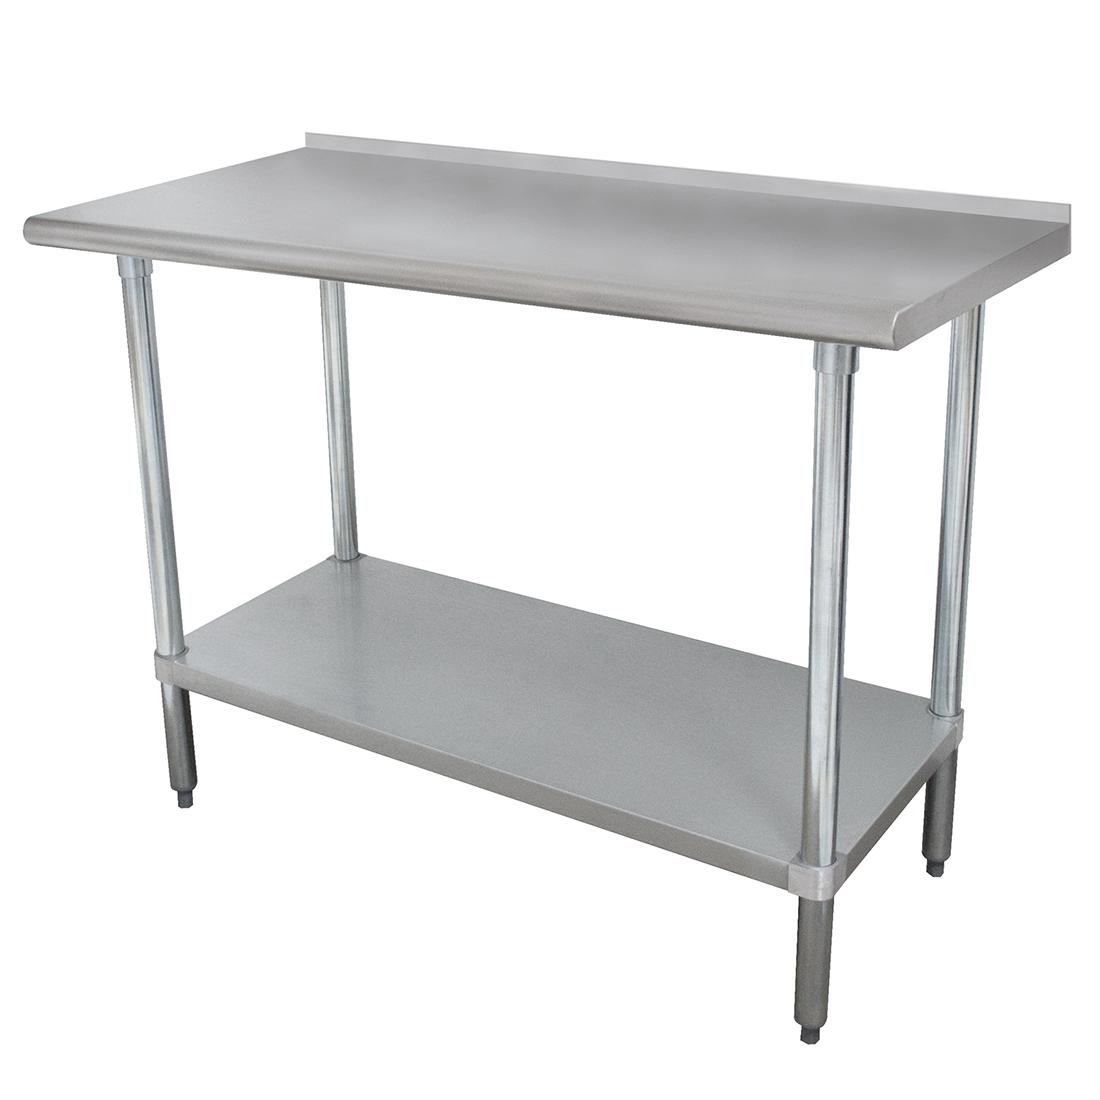 Advance Tabco FSS-308 work table,  85